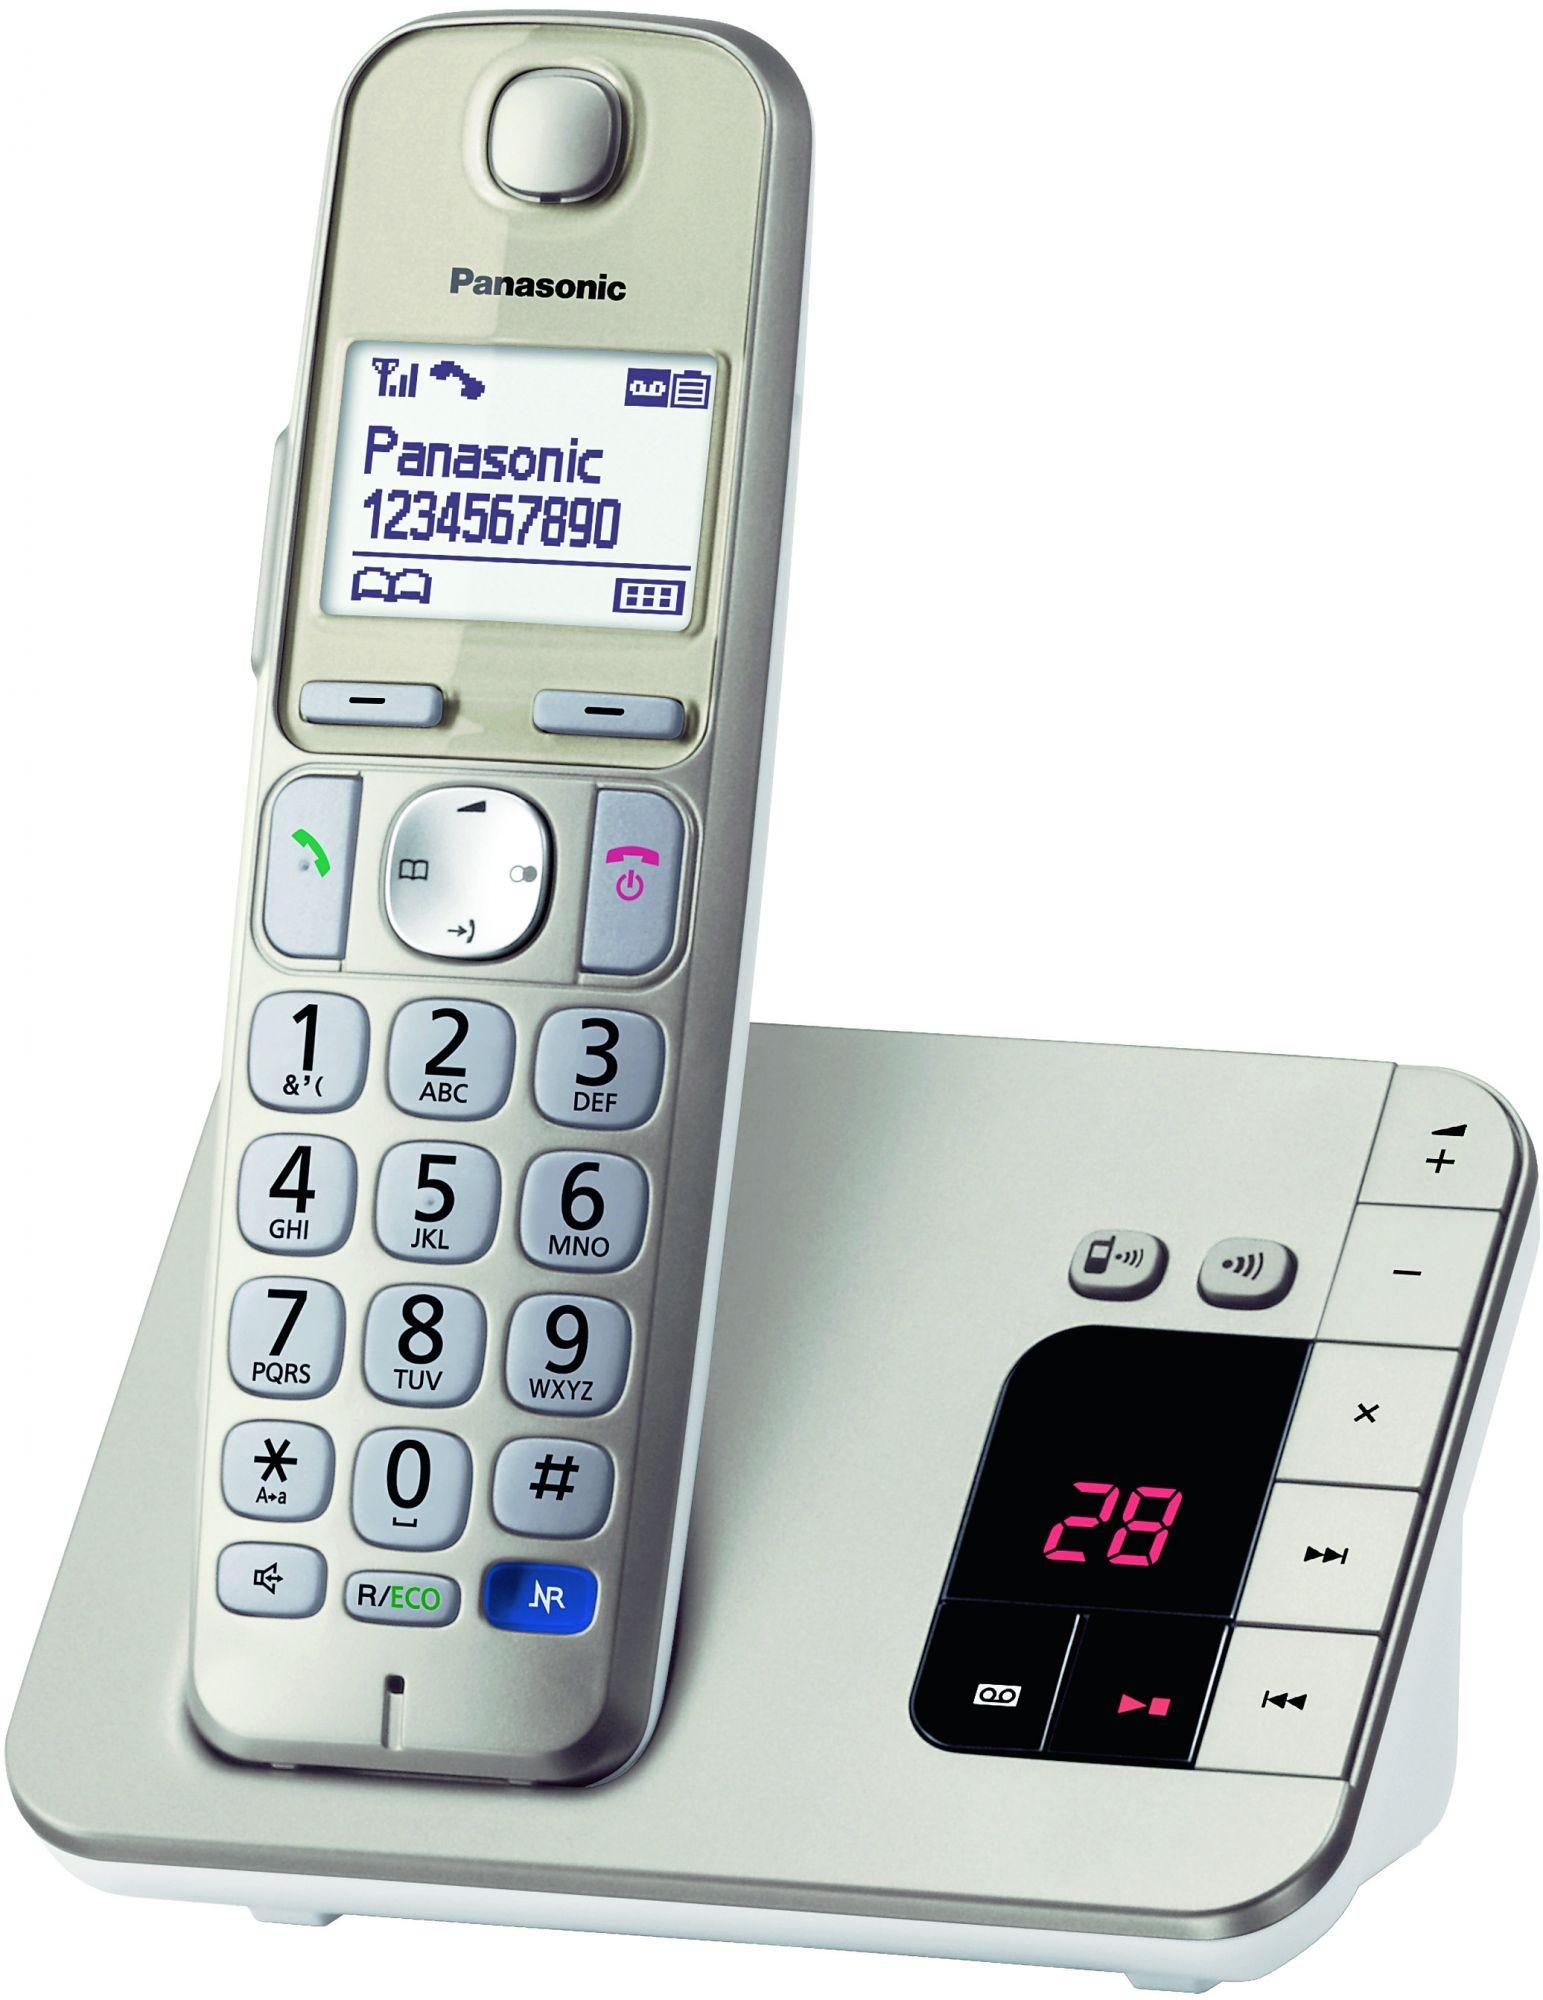 teamsix kx tge220gn champagner panasonic telekom. Black Bedroom Furniture Sets. Home Design Ideas